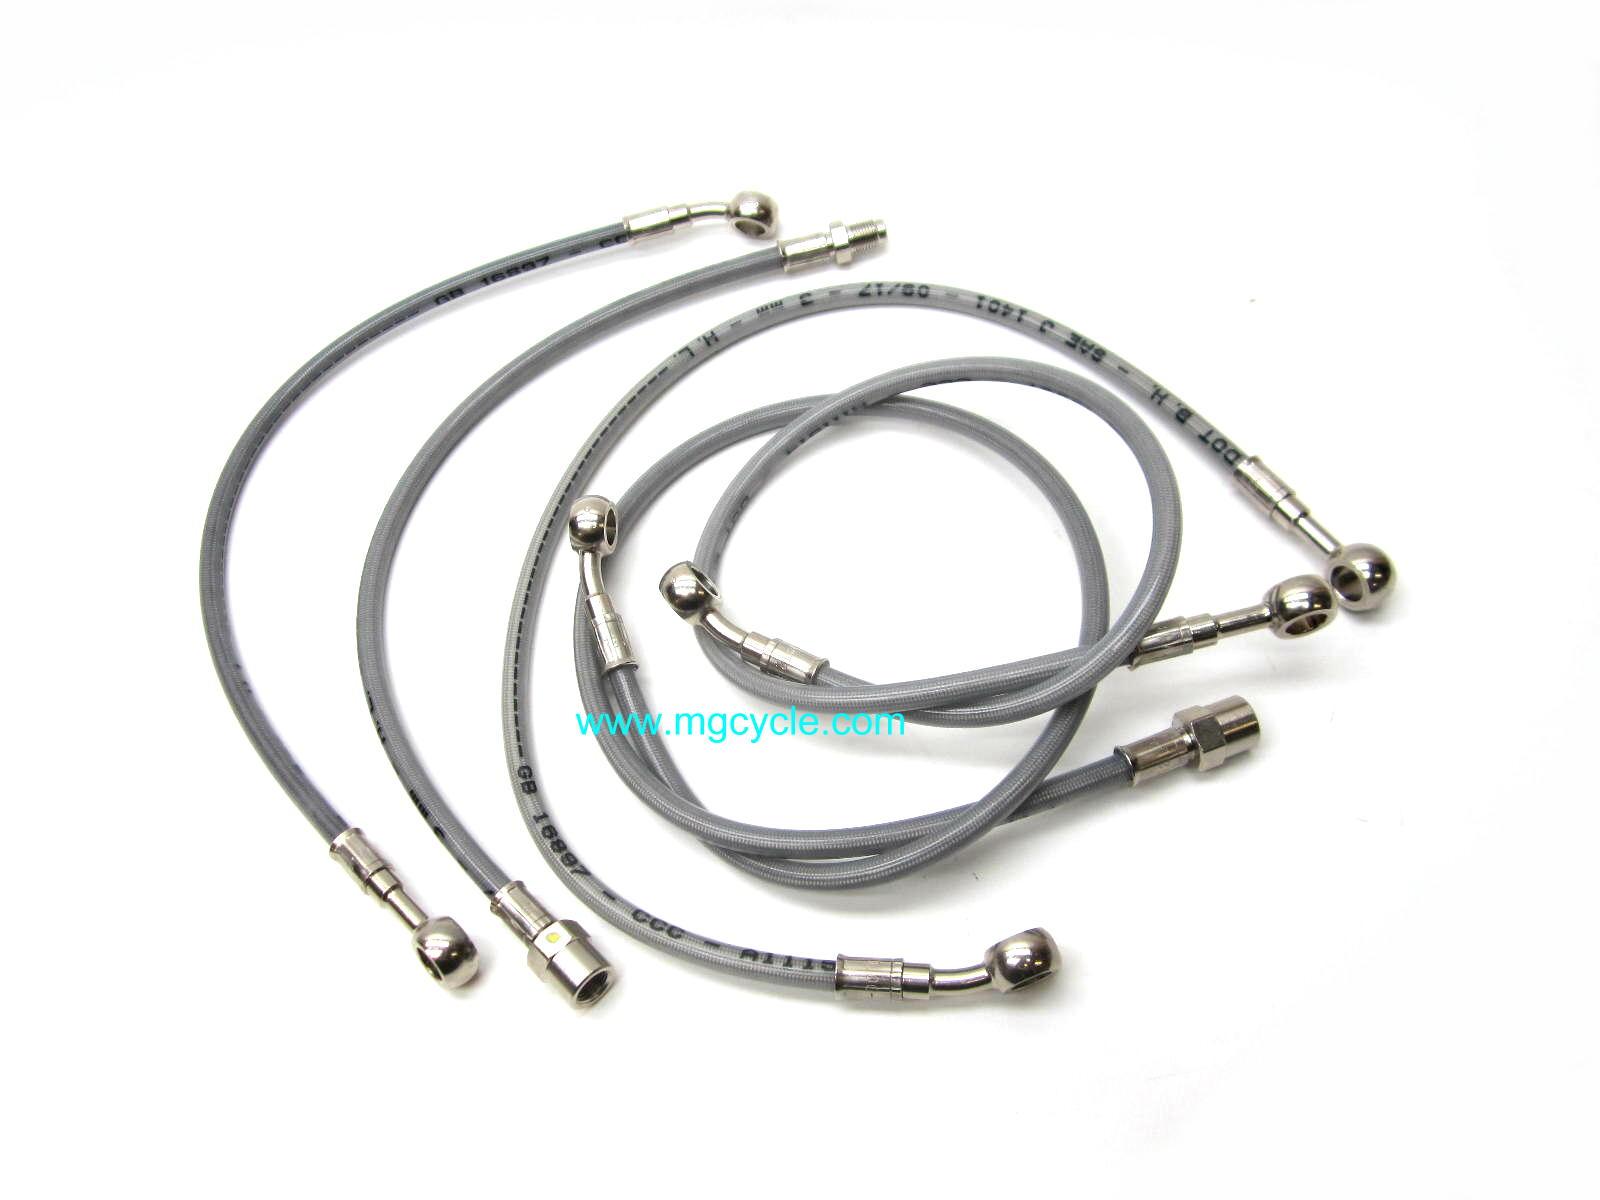 hoses fittings : MG Cycle, Moto Guzzi Parts and